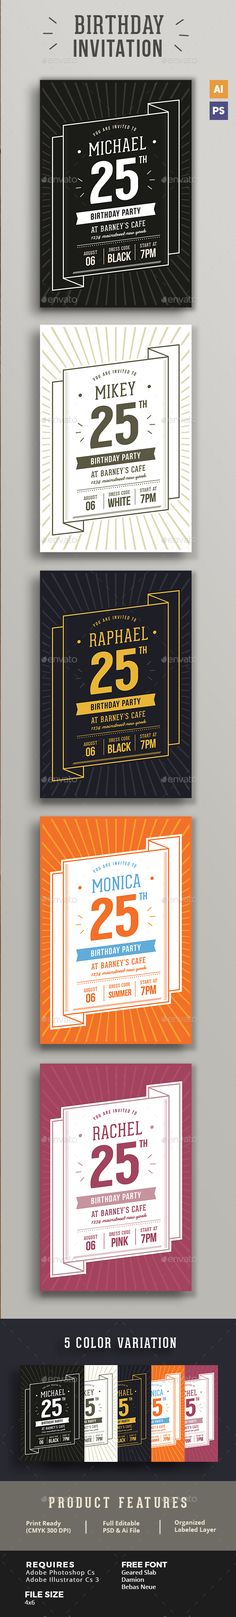 Green   Gold Birthday Invitation Gold birthday and Font logo - birthday invitation card template photoshop